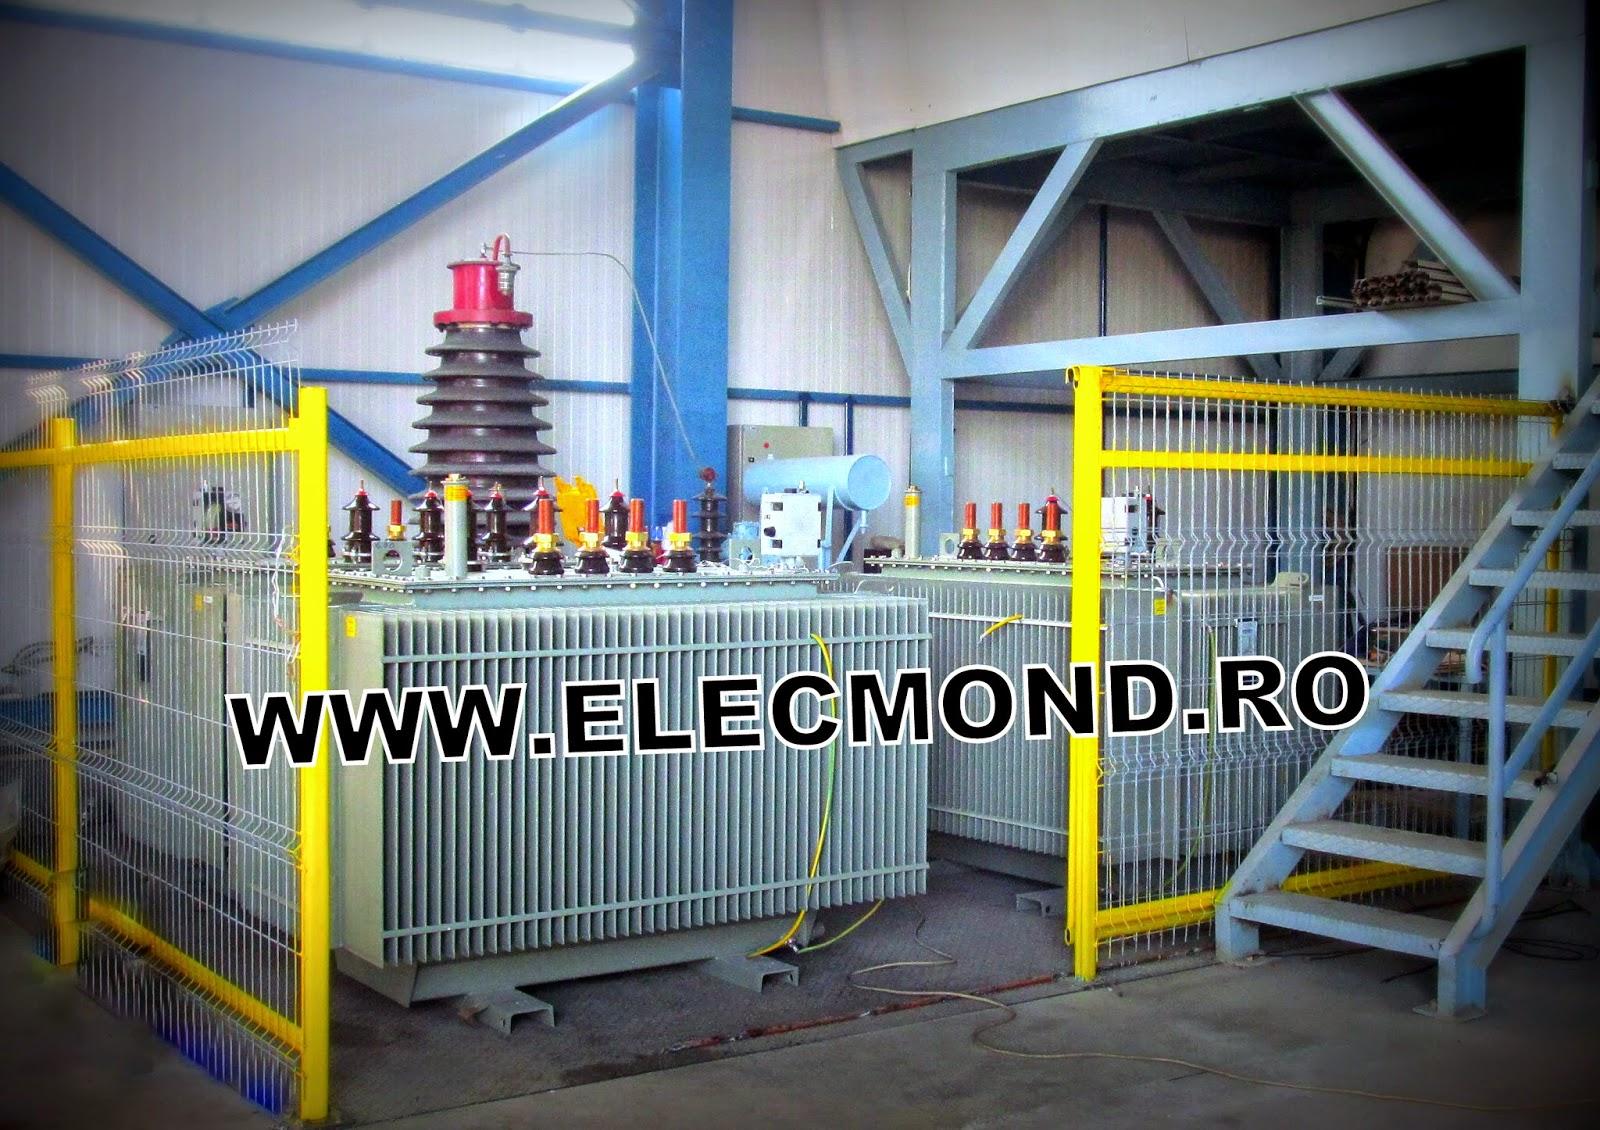 TRANSFORMATOARE  ,TRANSFORMATOARE ELECTRICE, OFERTA TRANSFORMATOARE, PRET TRANSFORMATOR , TRAFO  , OFERTA TRANSFORMATOARE ,transformatoare medie tensiune, TRANSFORMATOARE, TRANSFORMATOR , elecmond , elecmond electric